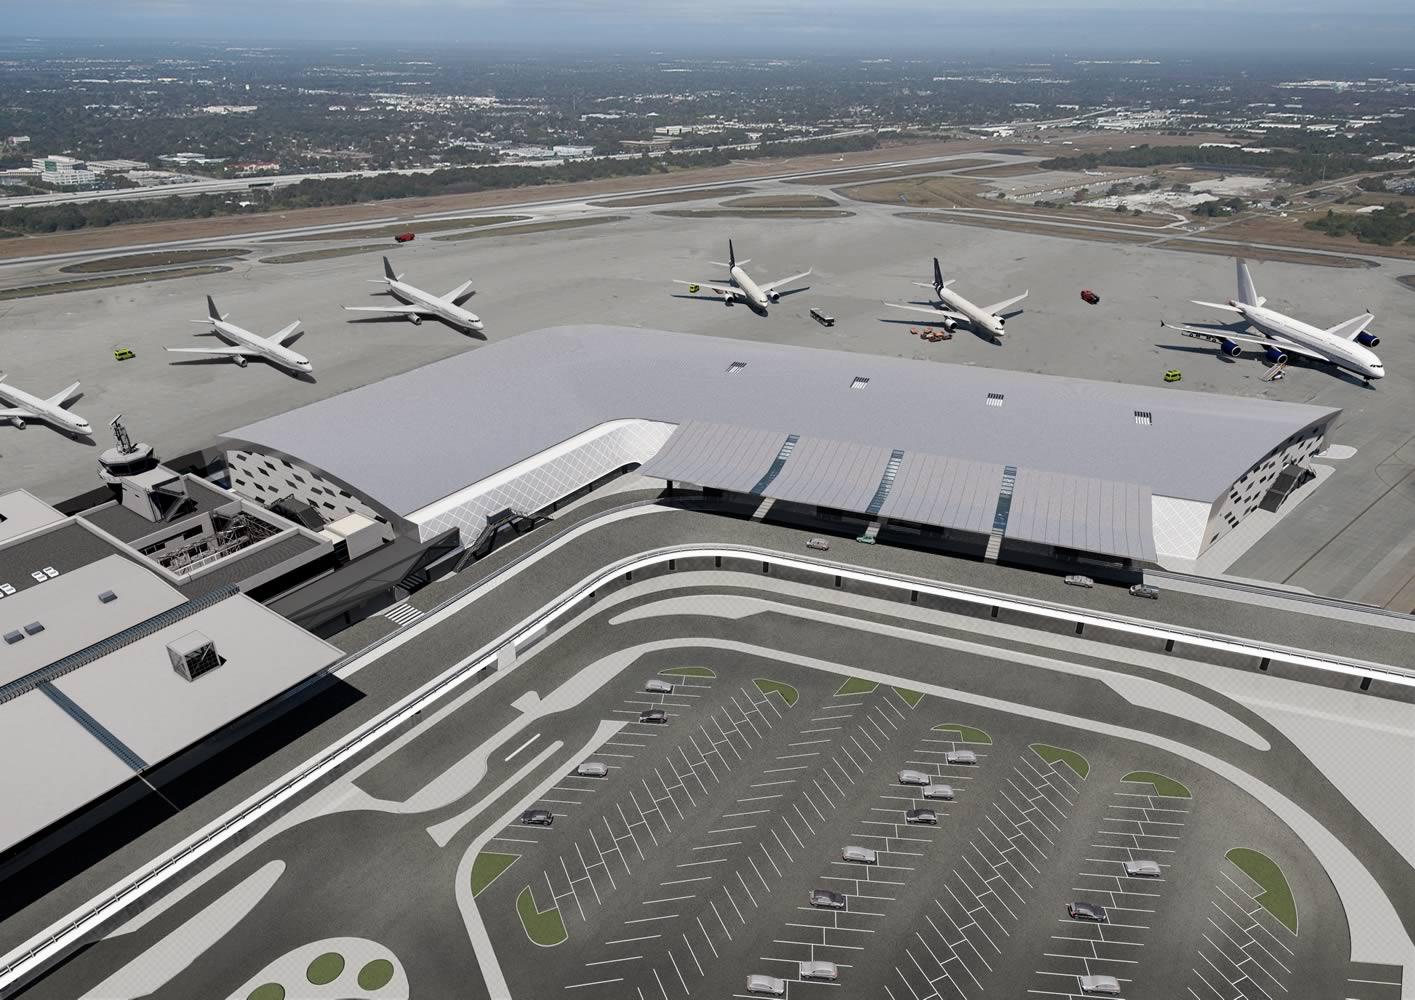 فرودگاه بینالمللی سالونیک